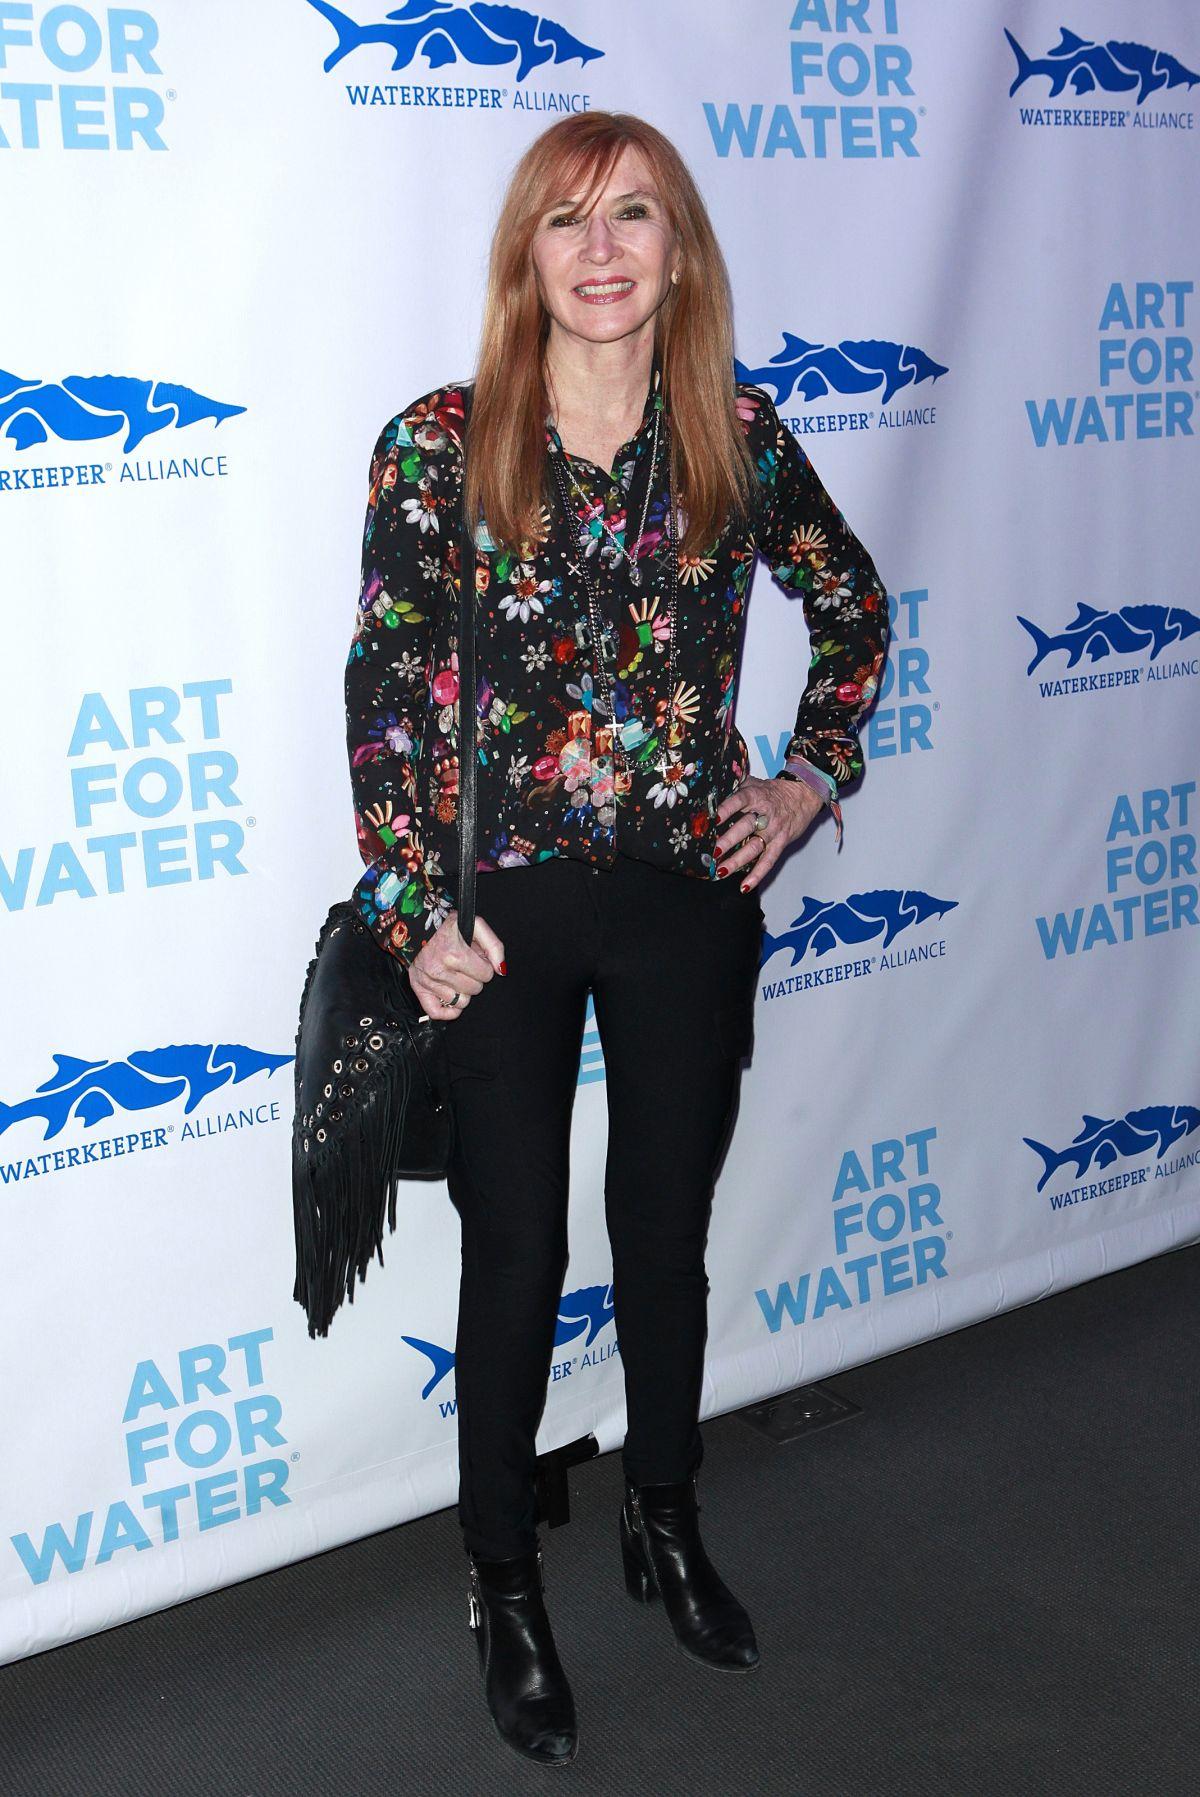 NICOLE MILLER at Art for Water Benefiring Waterkeeper ...